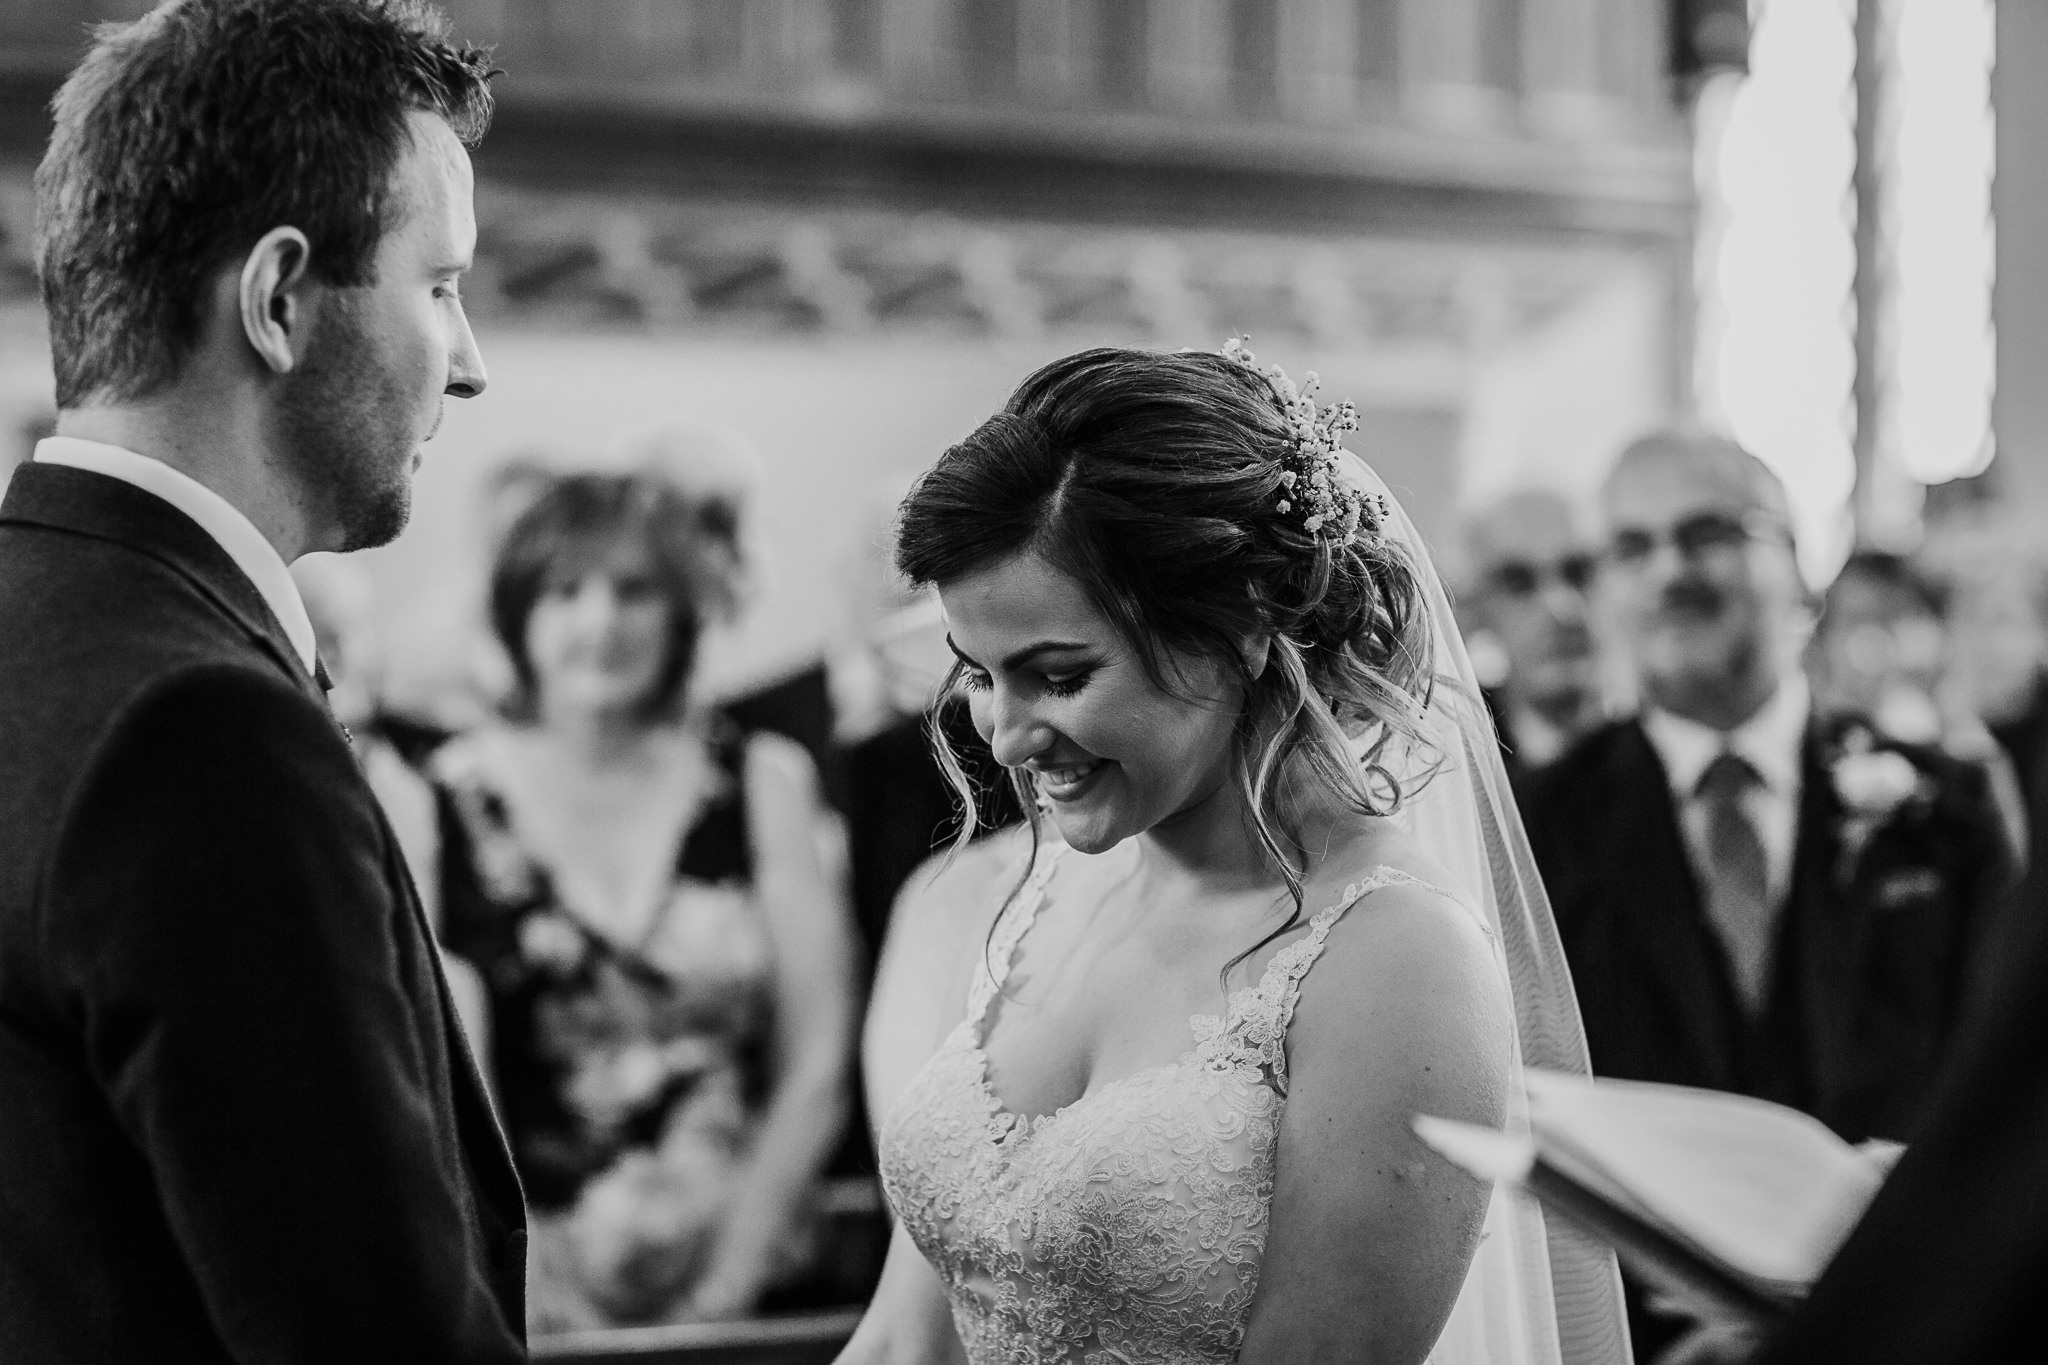 Northern-Ireland-wedding-photographers-the-martins-outdoor-barn-wedding-71.jpg